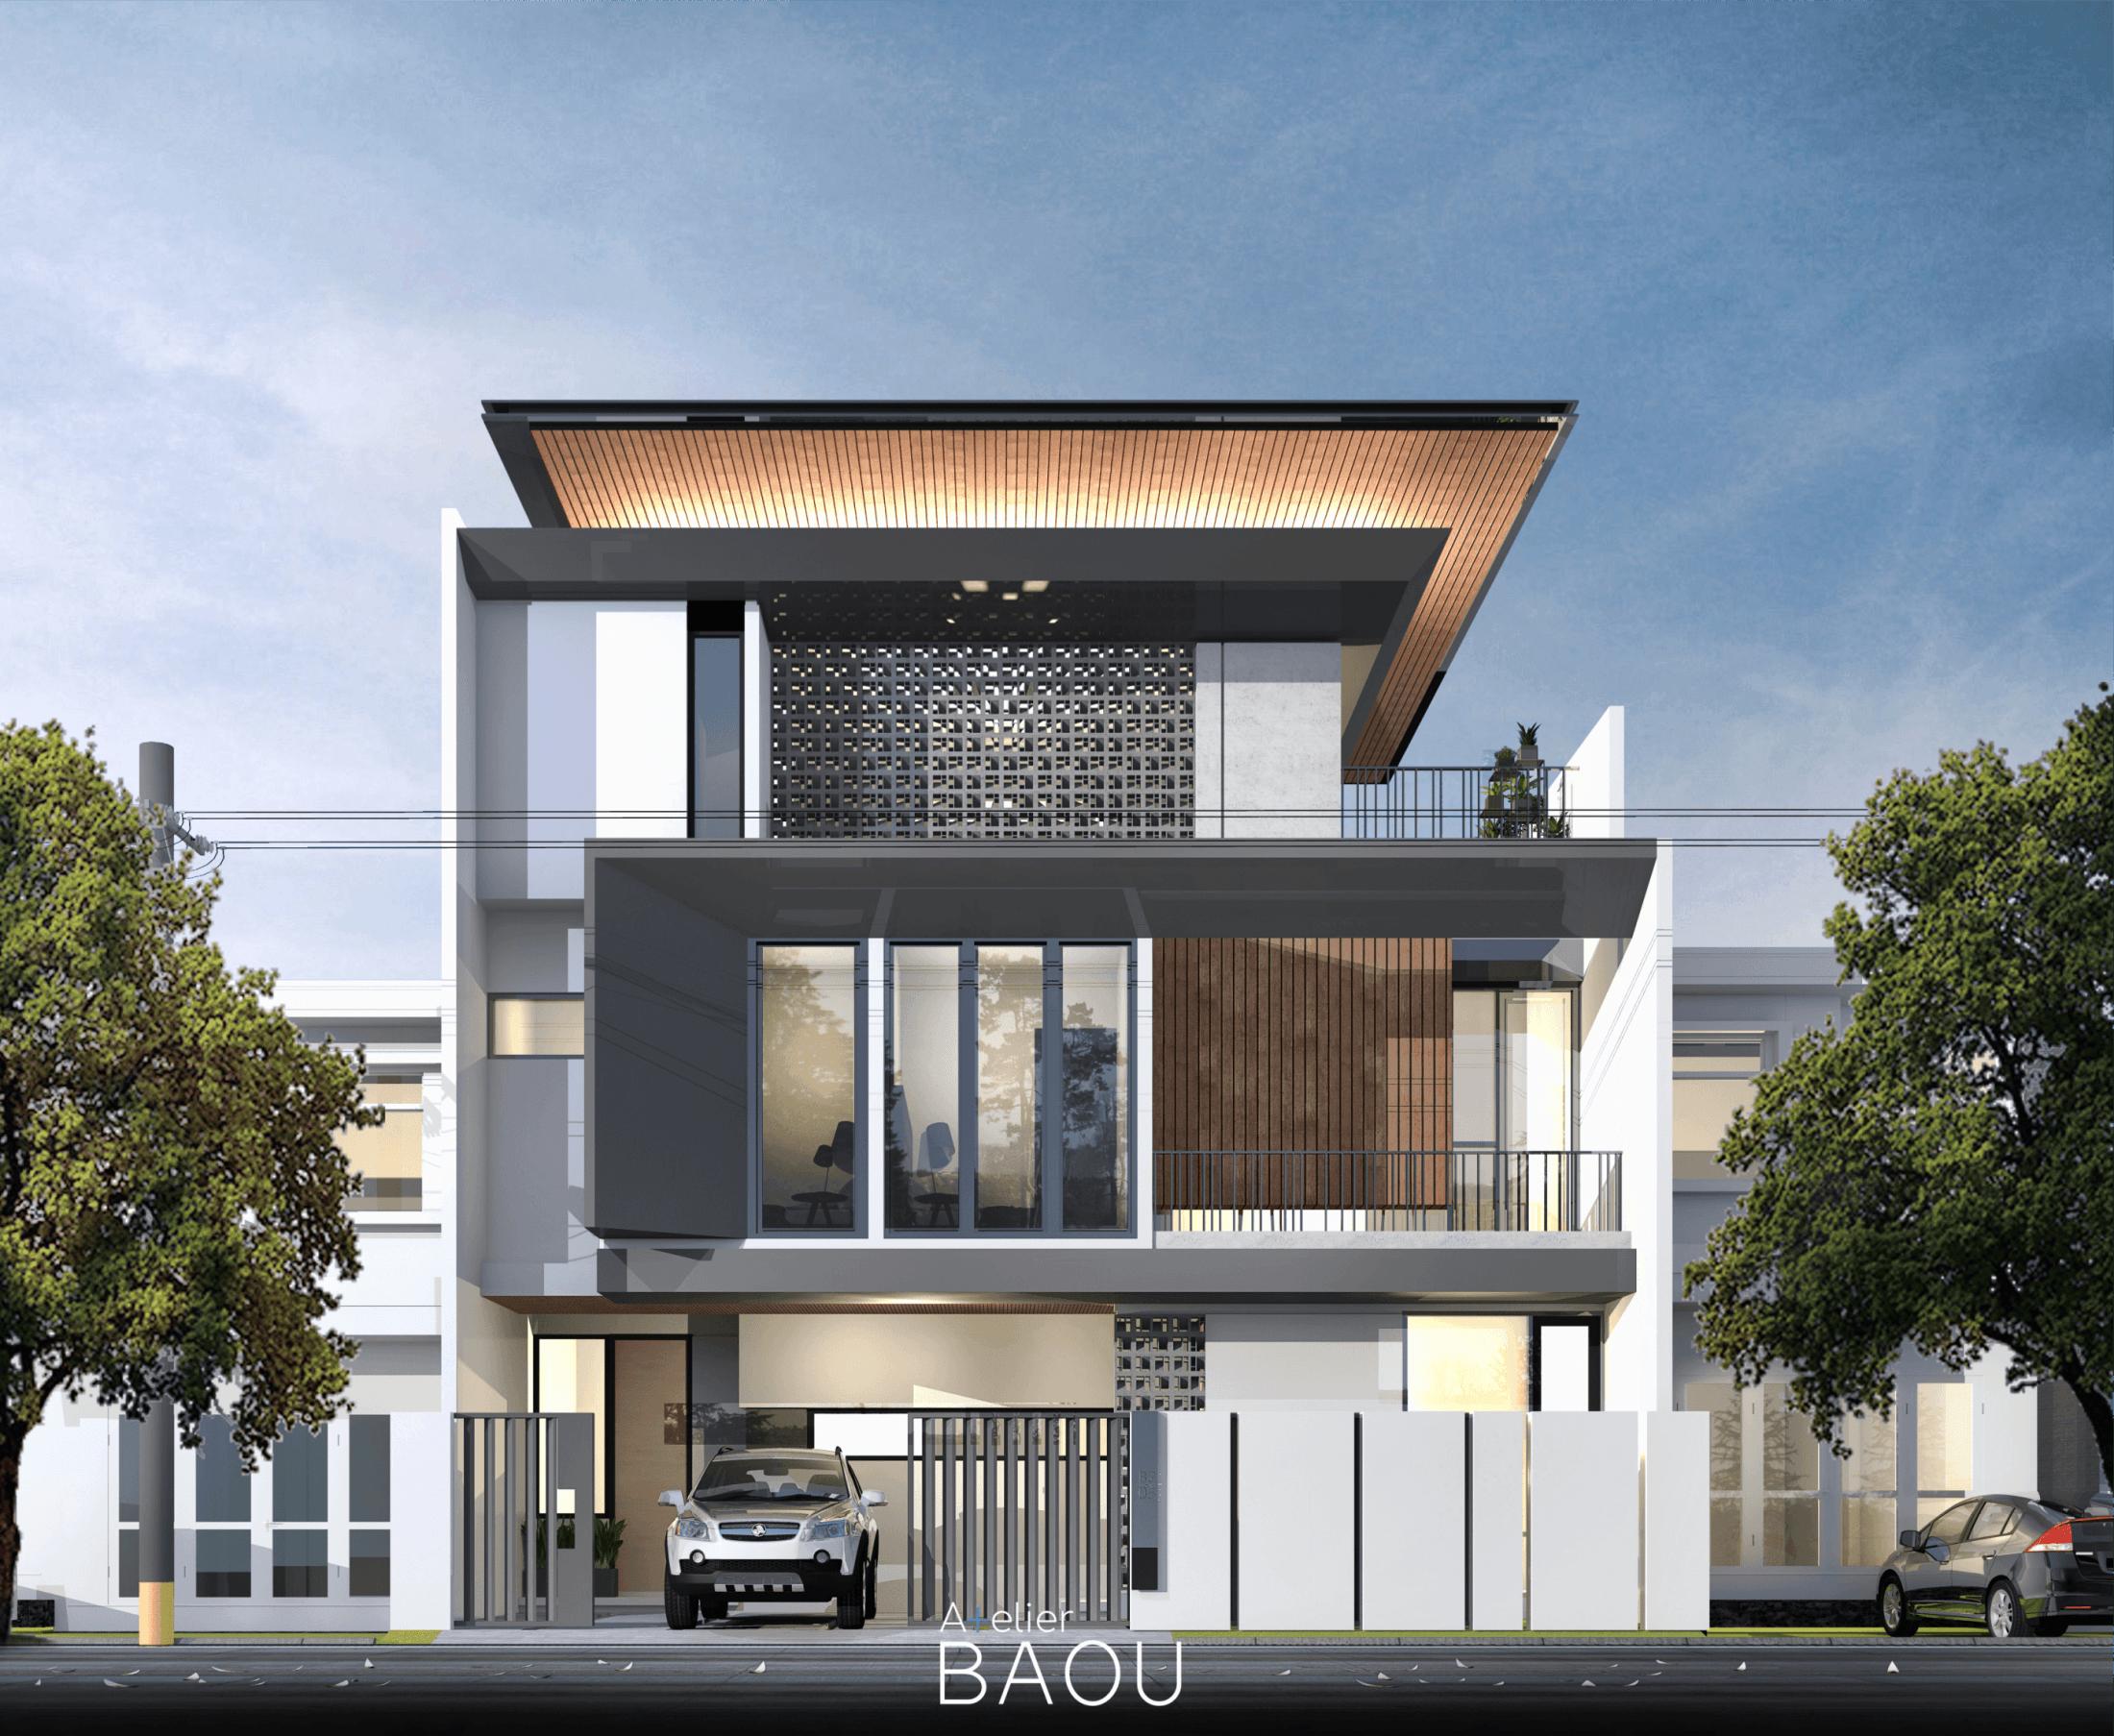 Atelier Baou Mc House Cikarang, Bekasi, Jawa Barat, Indonesia Cikarang, Bekasi, Jawa Barat, Indonesia Atelier-Baou-Mc-House  86490